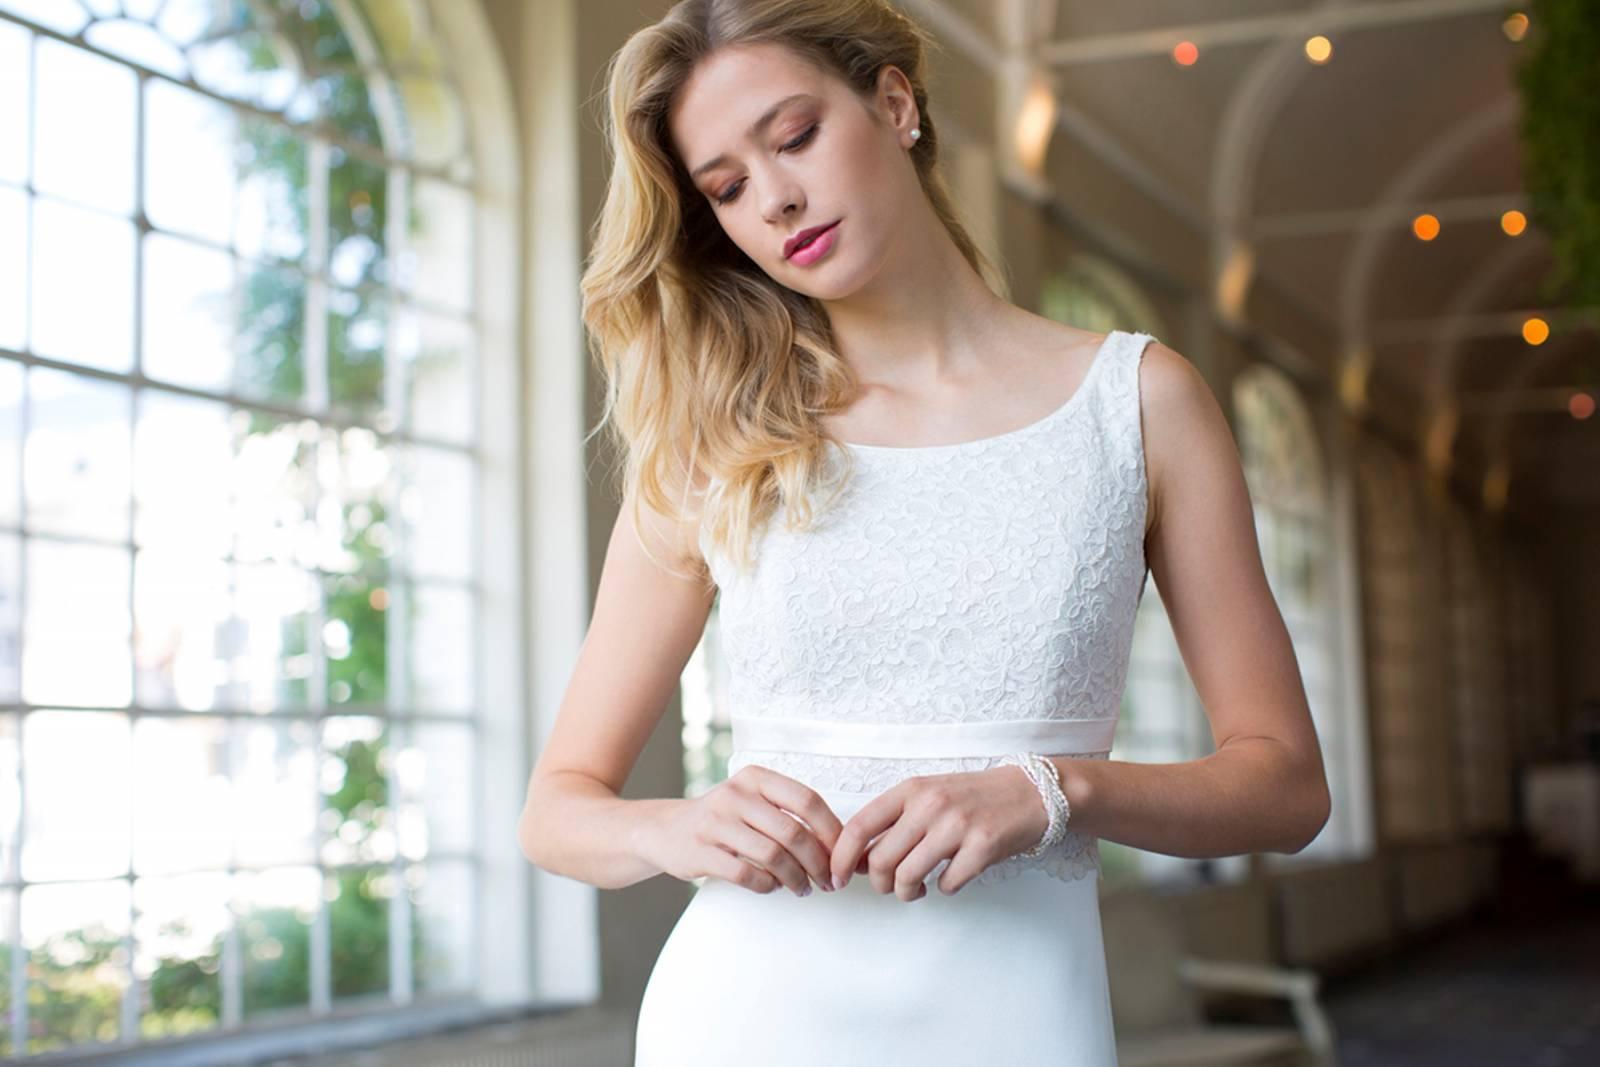 House of Weddings Dianna David Bruidsjurk Trouwjurk Bruidsmode Ontwerper Op Maat Brussel Couture (34) (Custom)